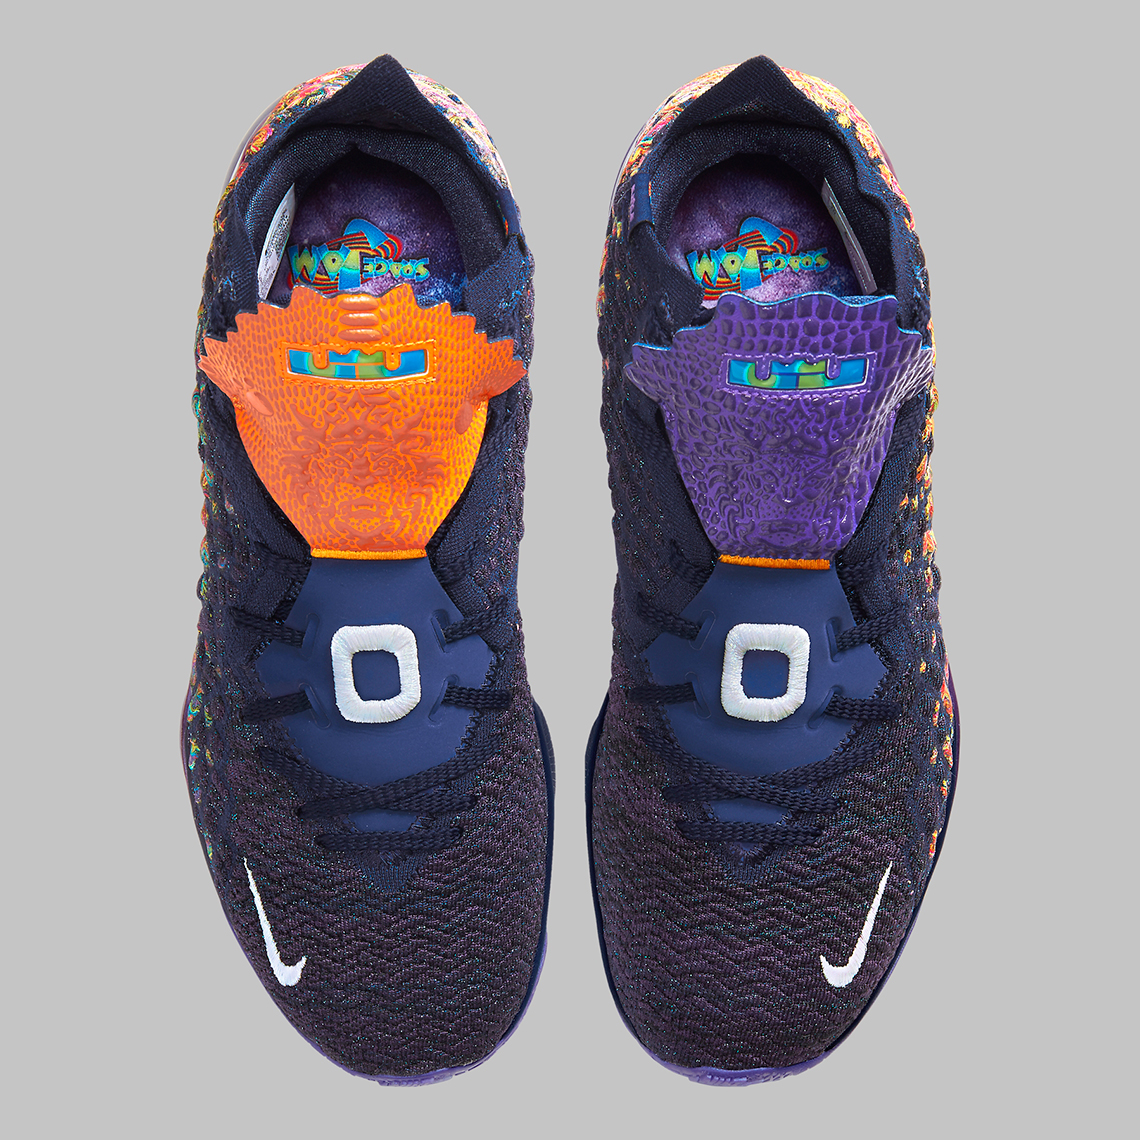 Nike LeBron 17 Space Jam 2